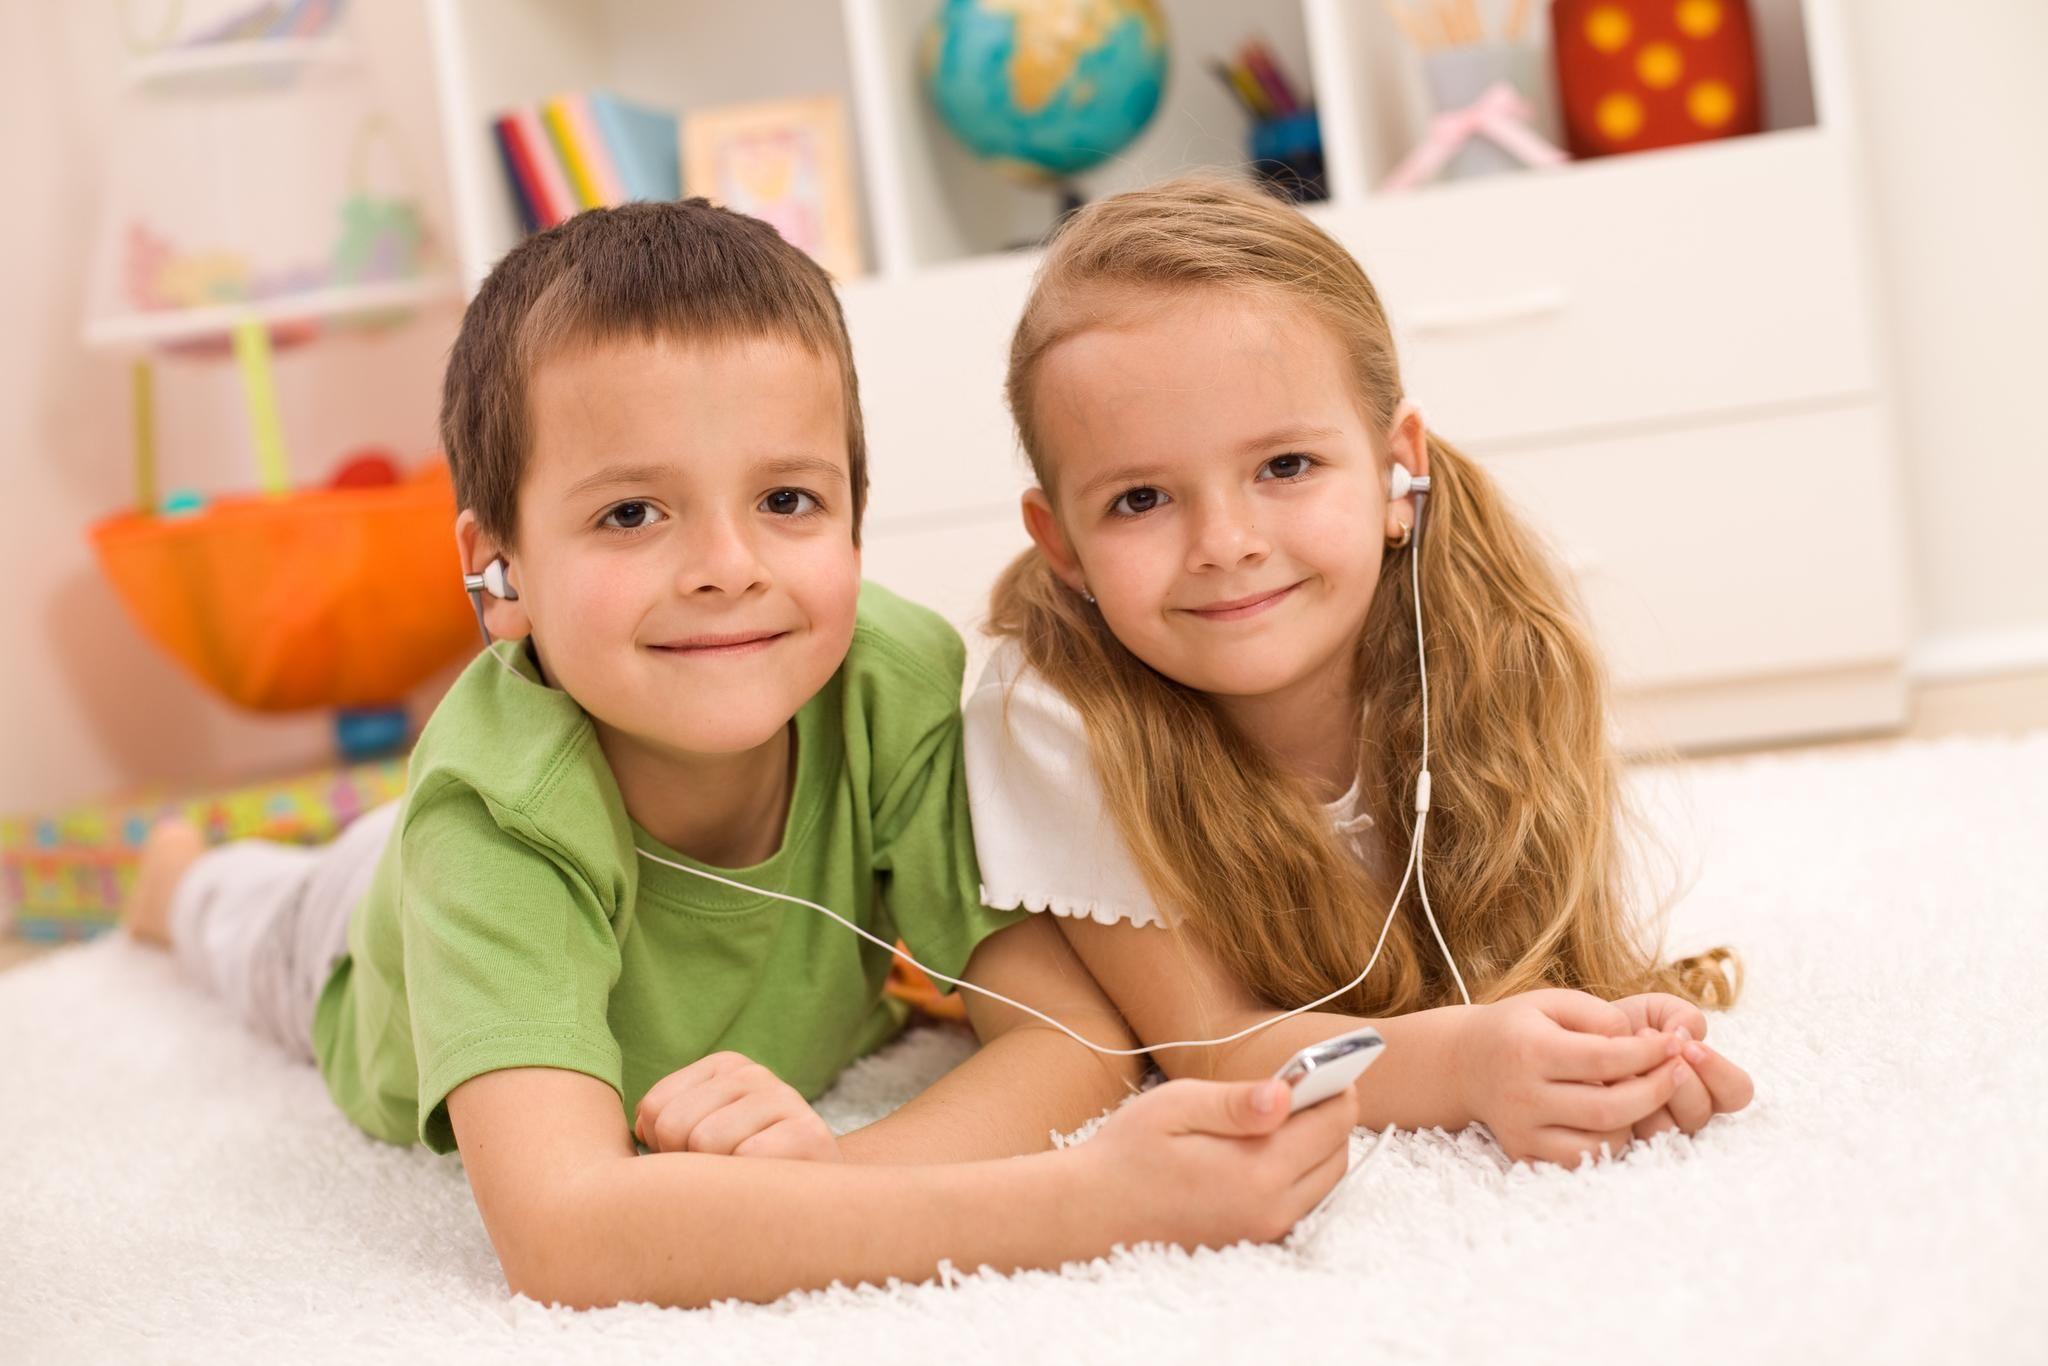 How long should boy/girl twins share a room? | Twins, Boy ...